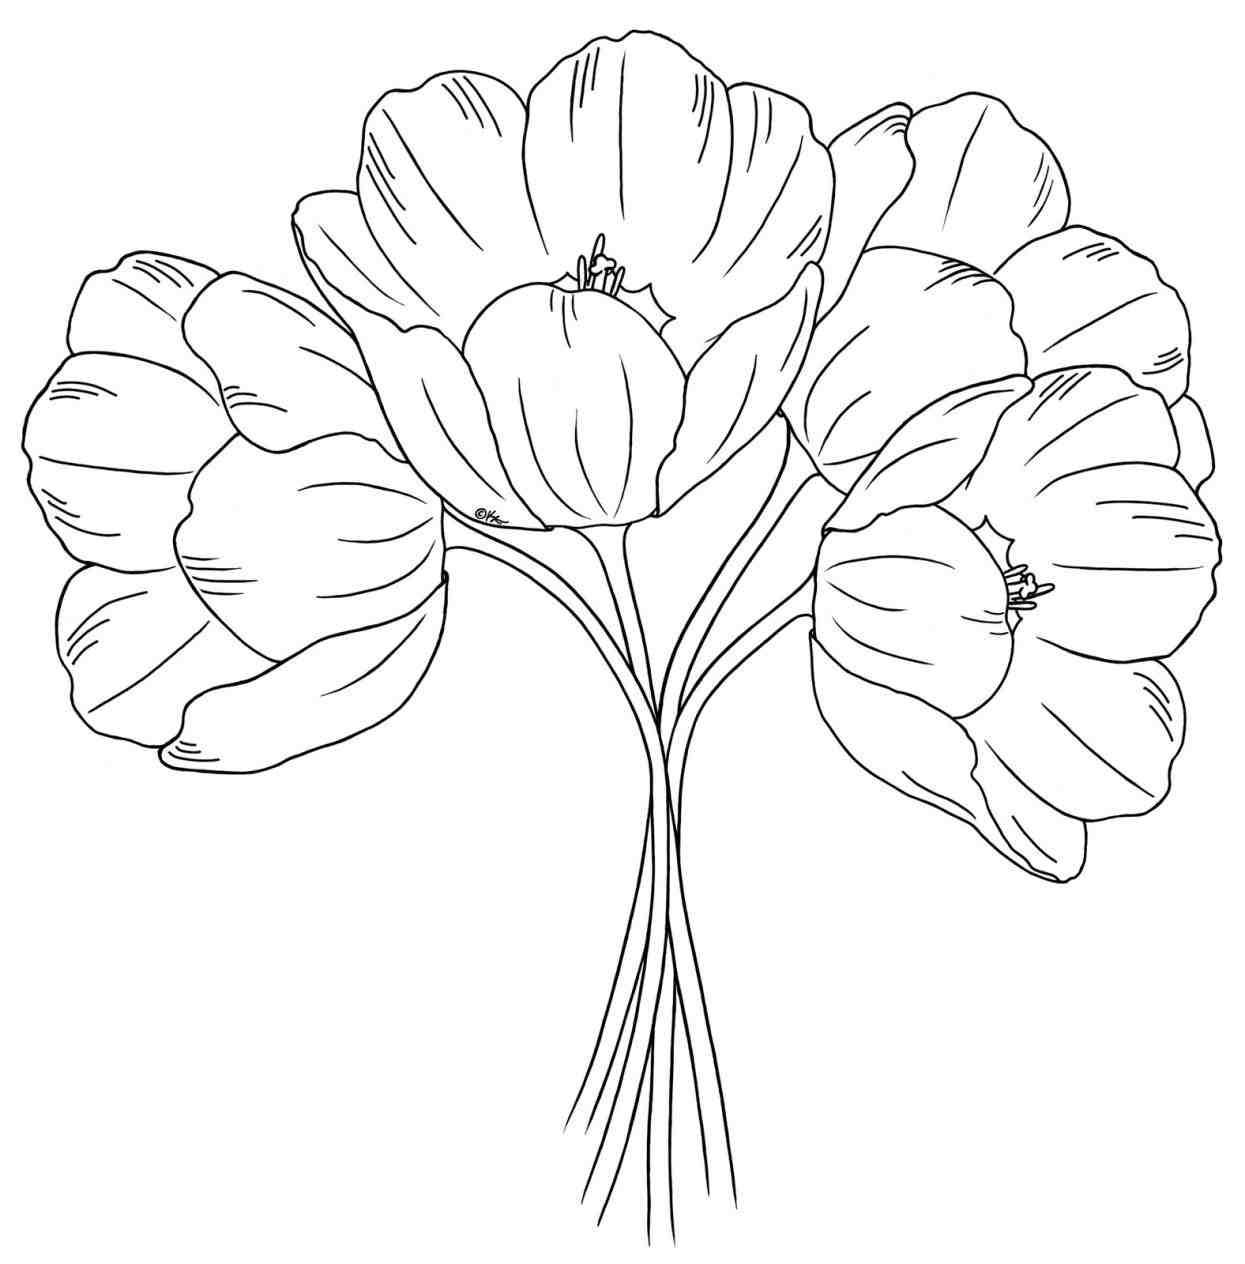 1245x1264 Tulip Drawing Google Search. Pin Drawn Tulip Detail Drawing 7